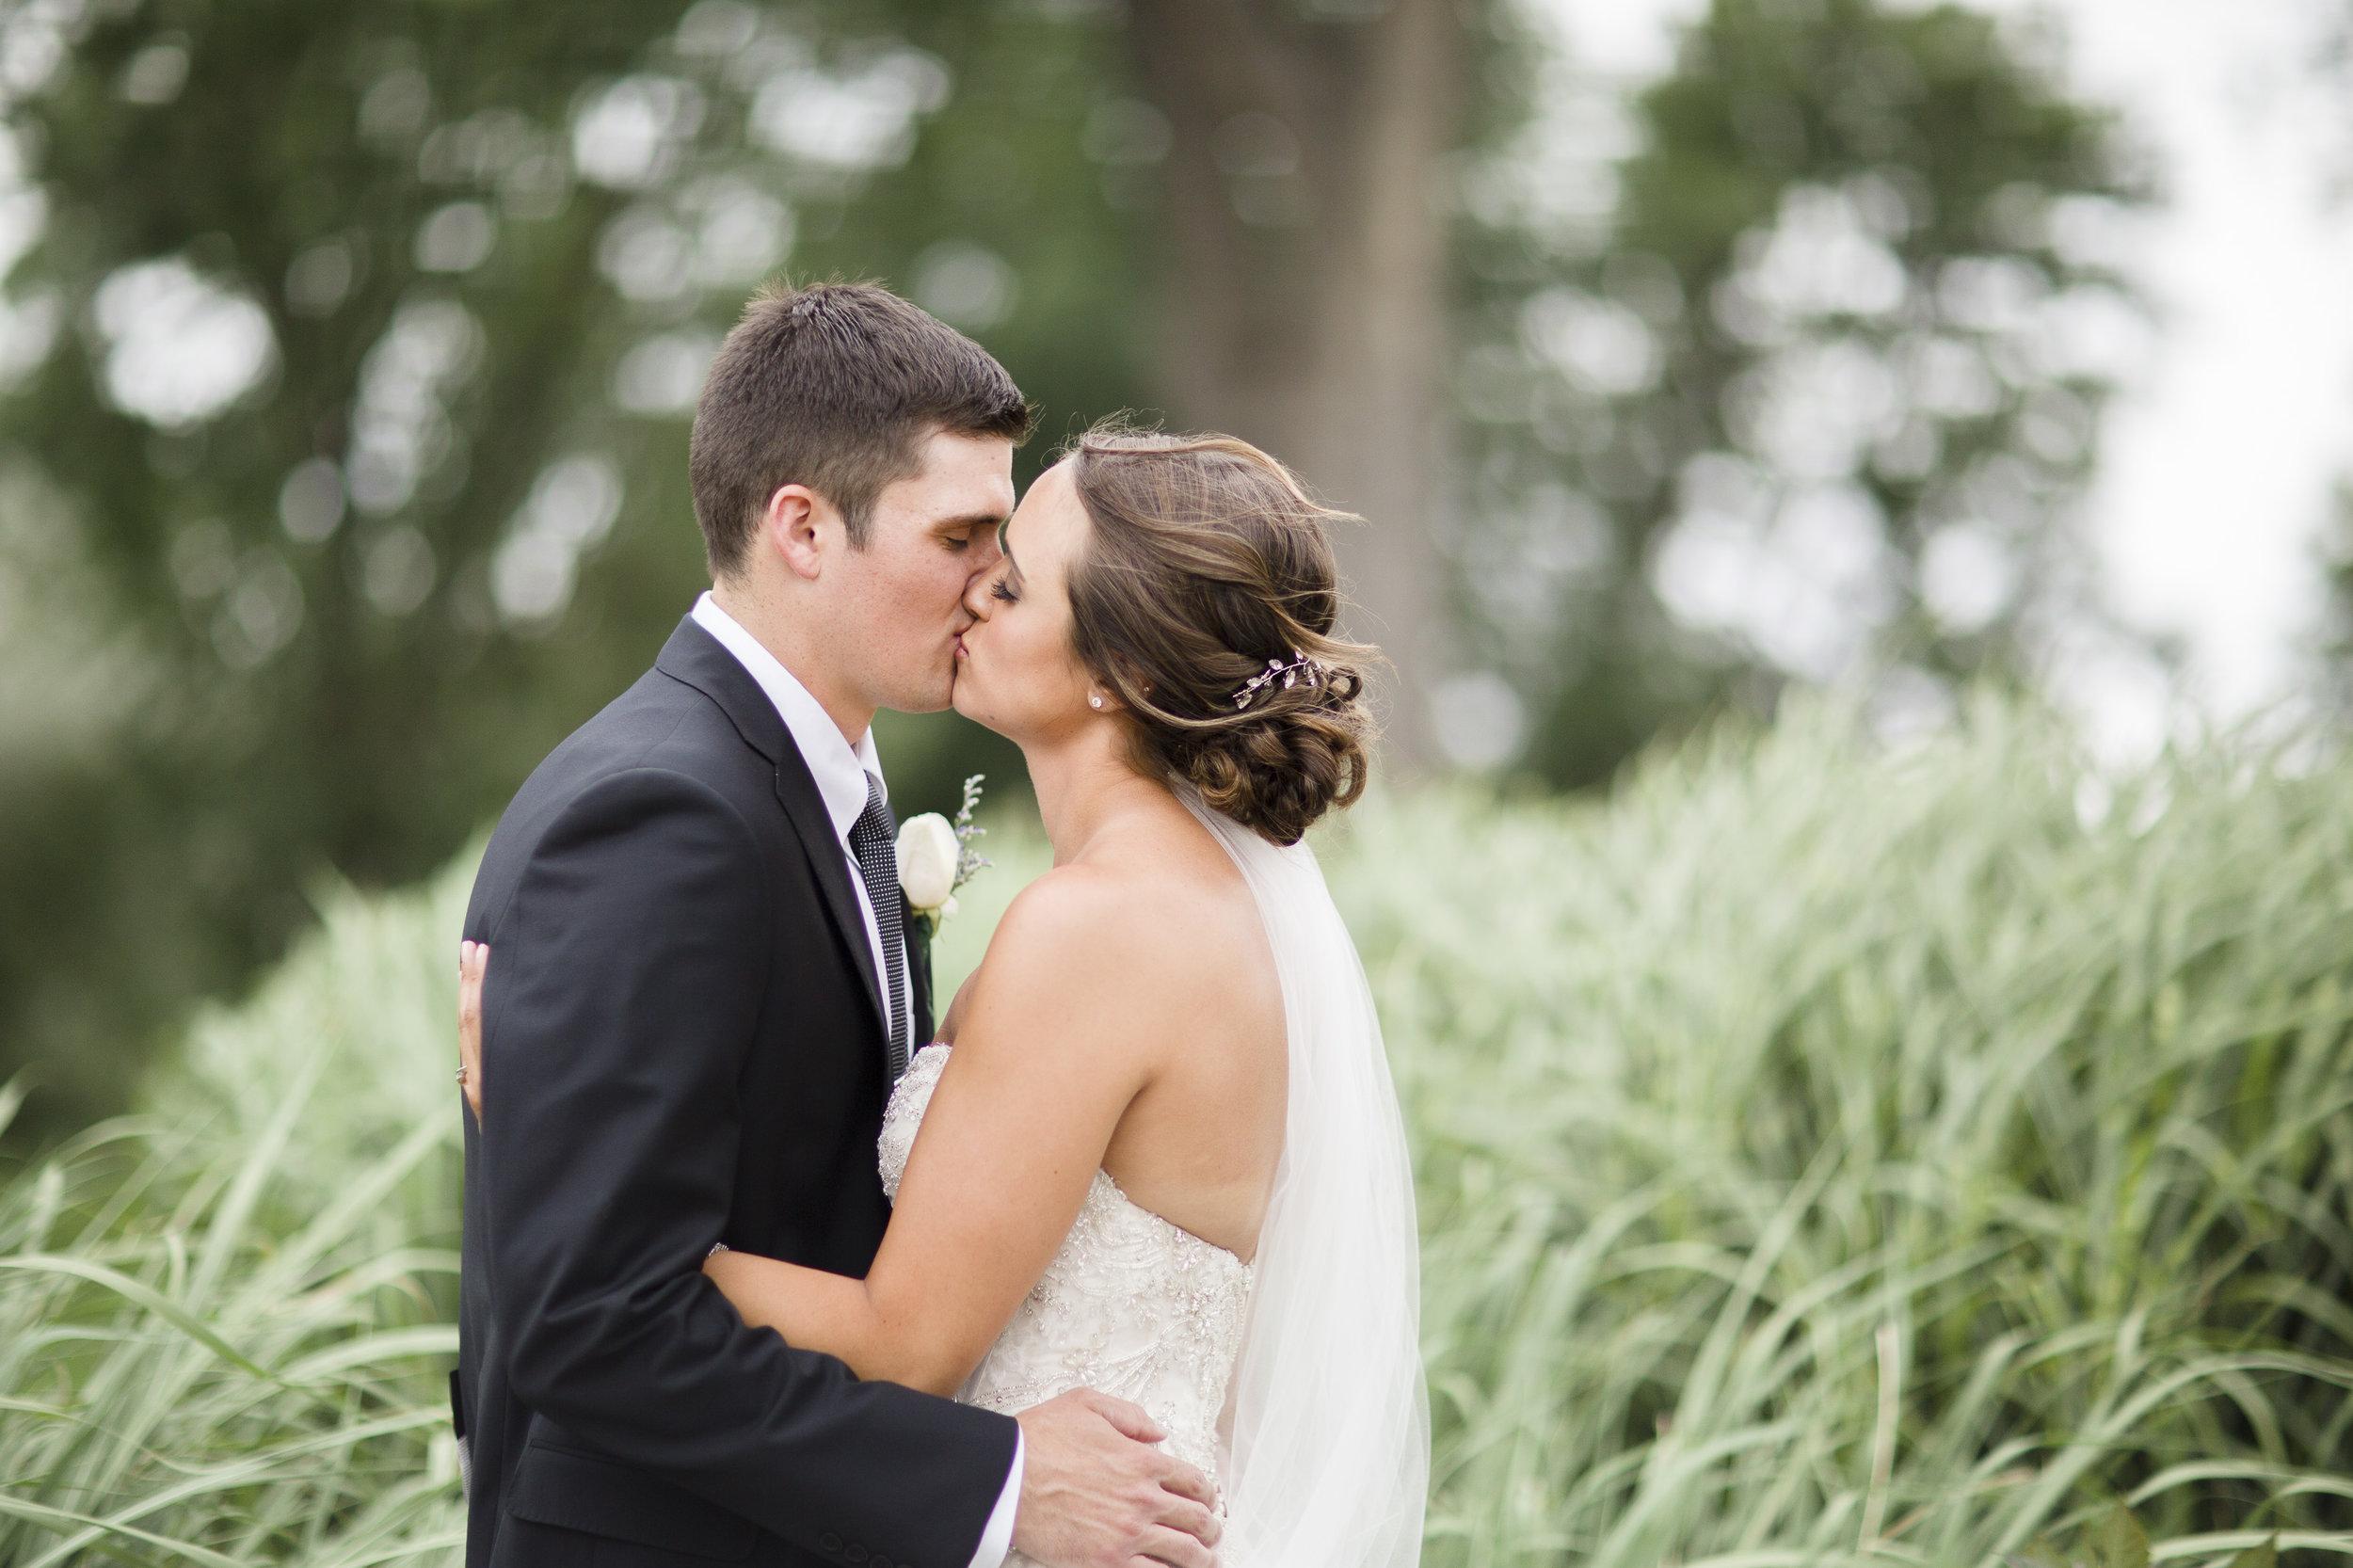 kristen-vance-wash-park-denver-colorado-wedding-2017-3.jpg